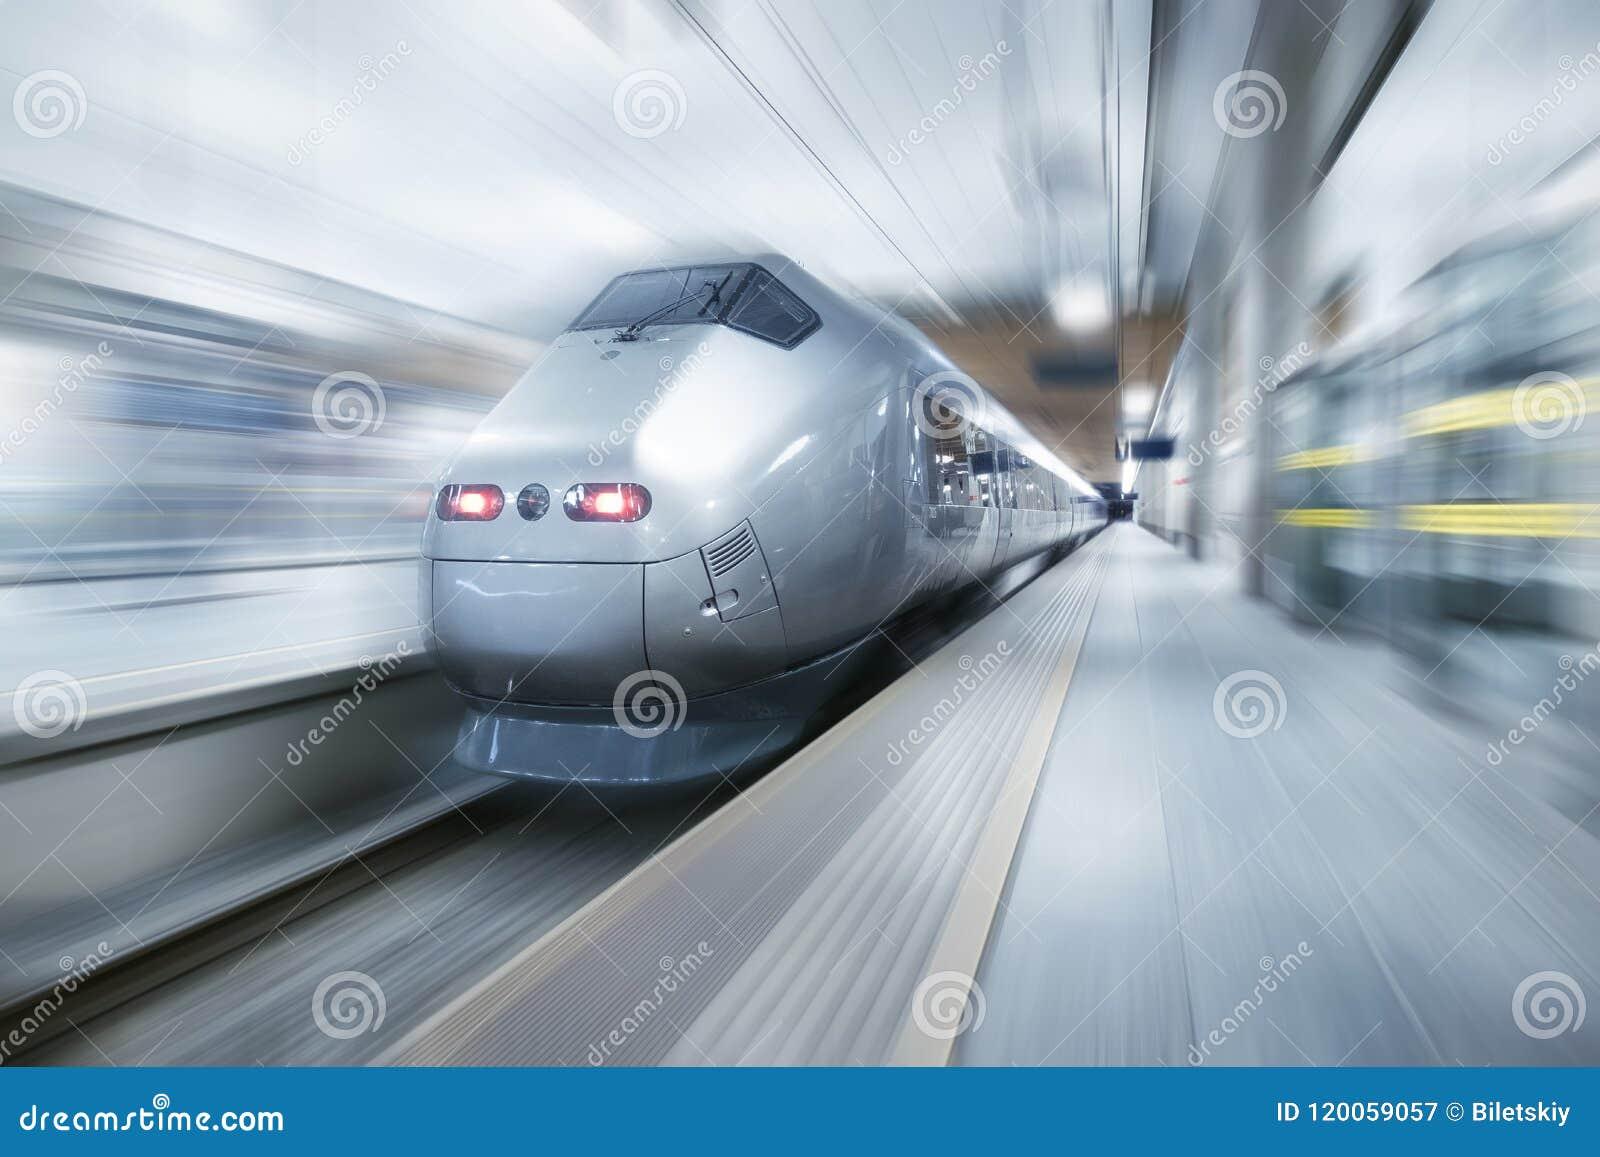 Concept and idea of trasportation